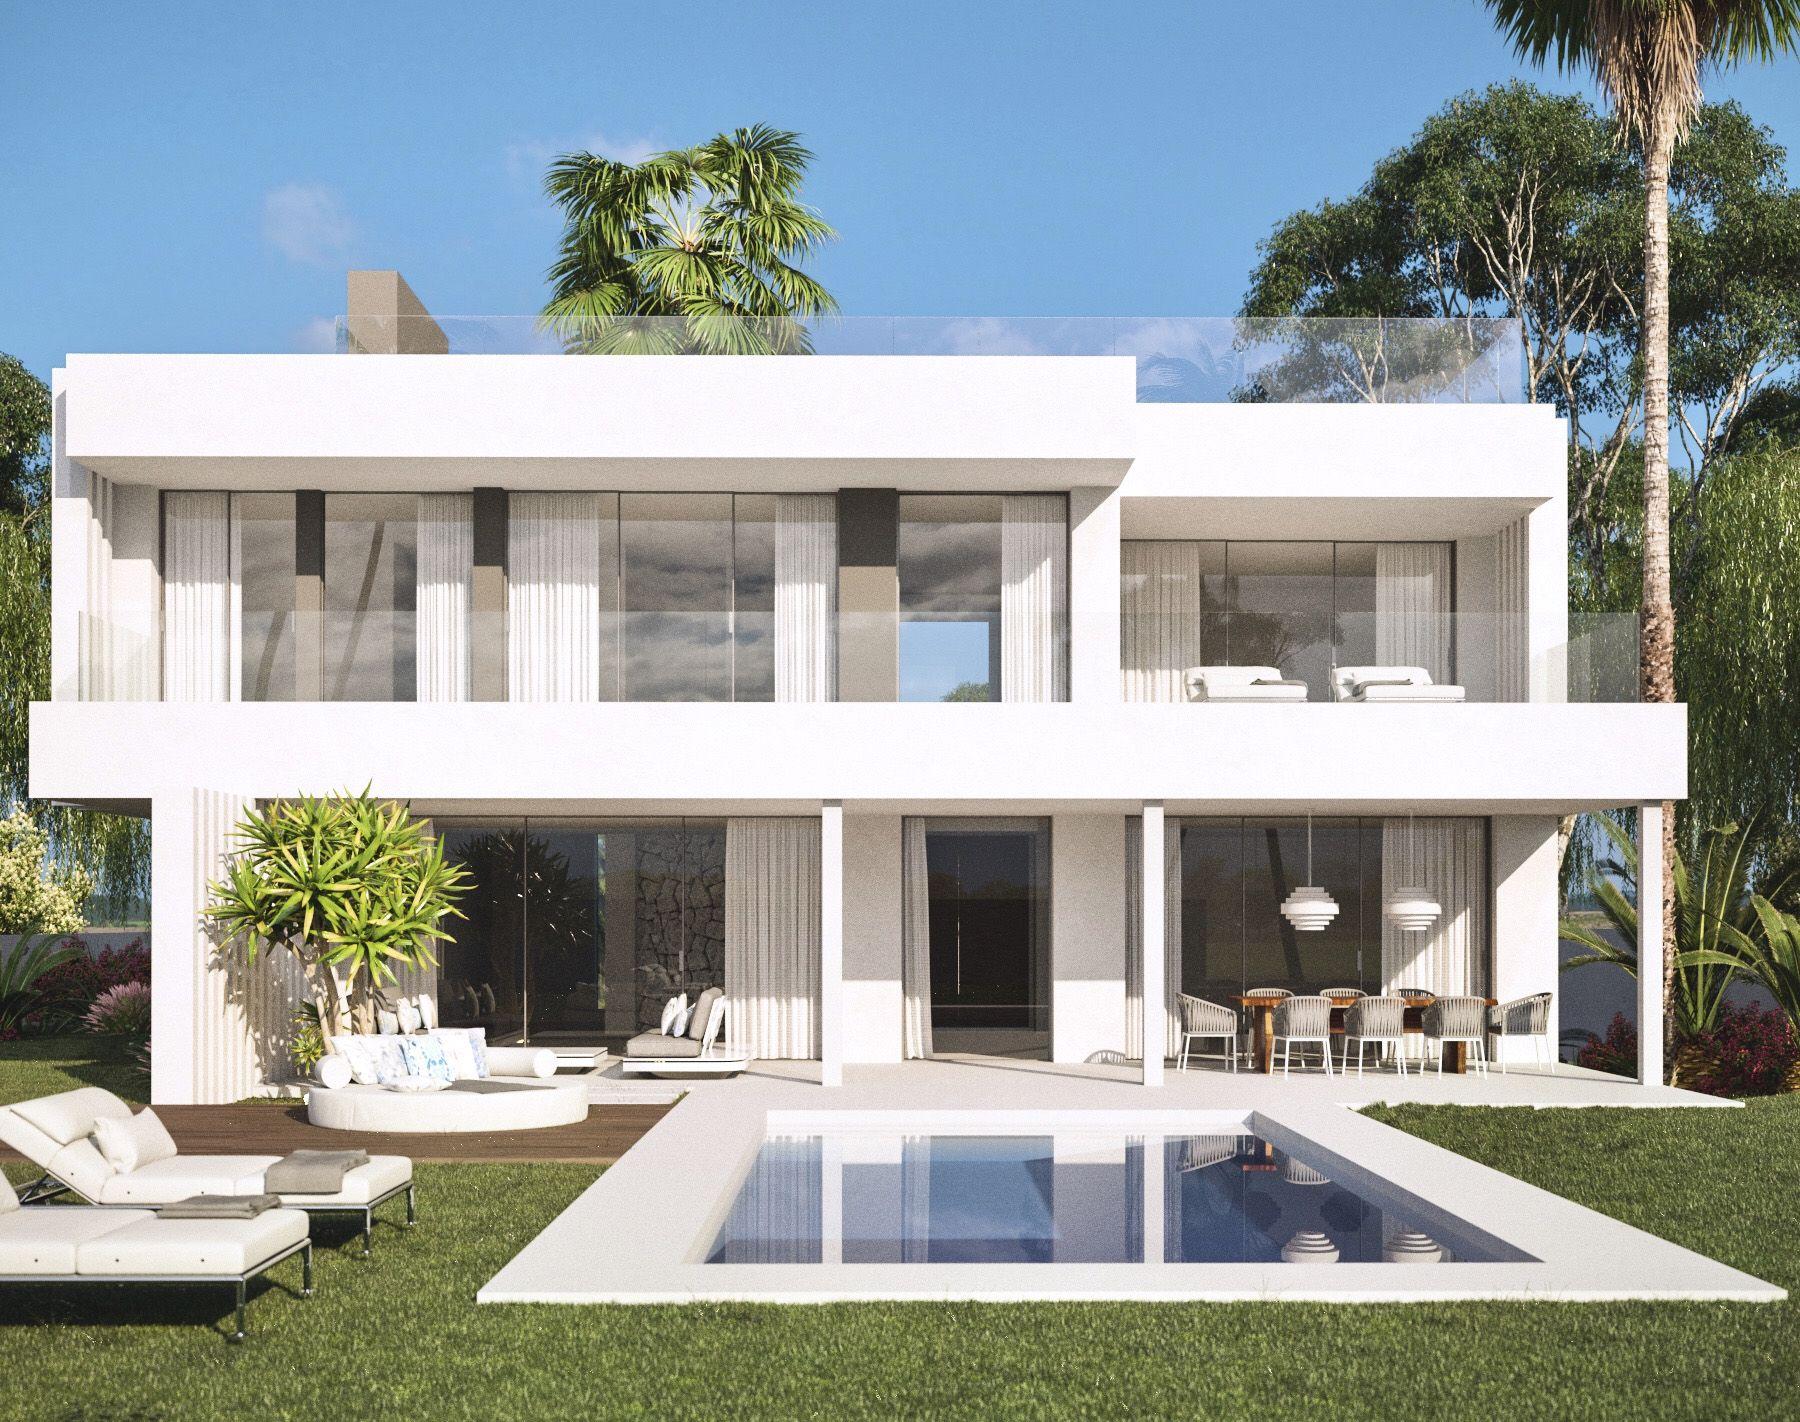 projekt f r moderne villen mit meerblick zu verkaufen in cancelada bei estepona. Black Bedroom Furniture Sets. Home Design Ideas